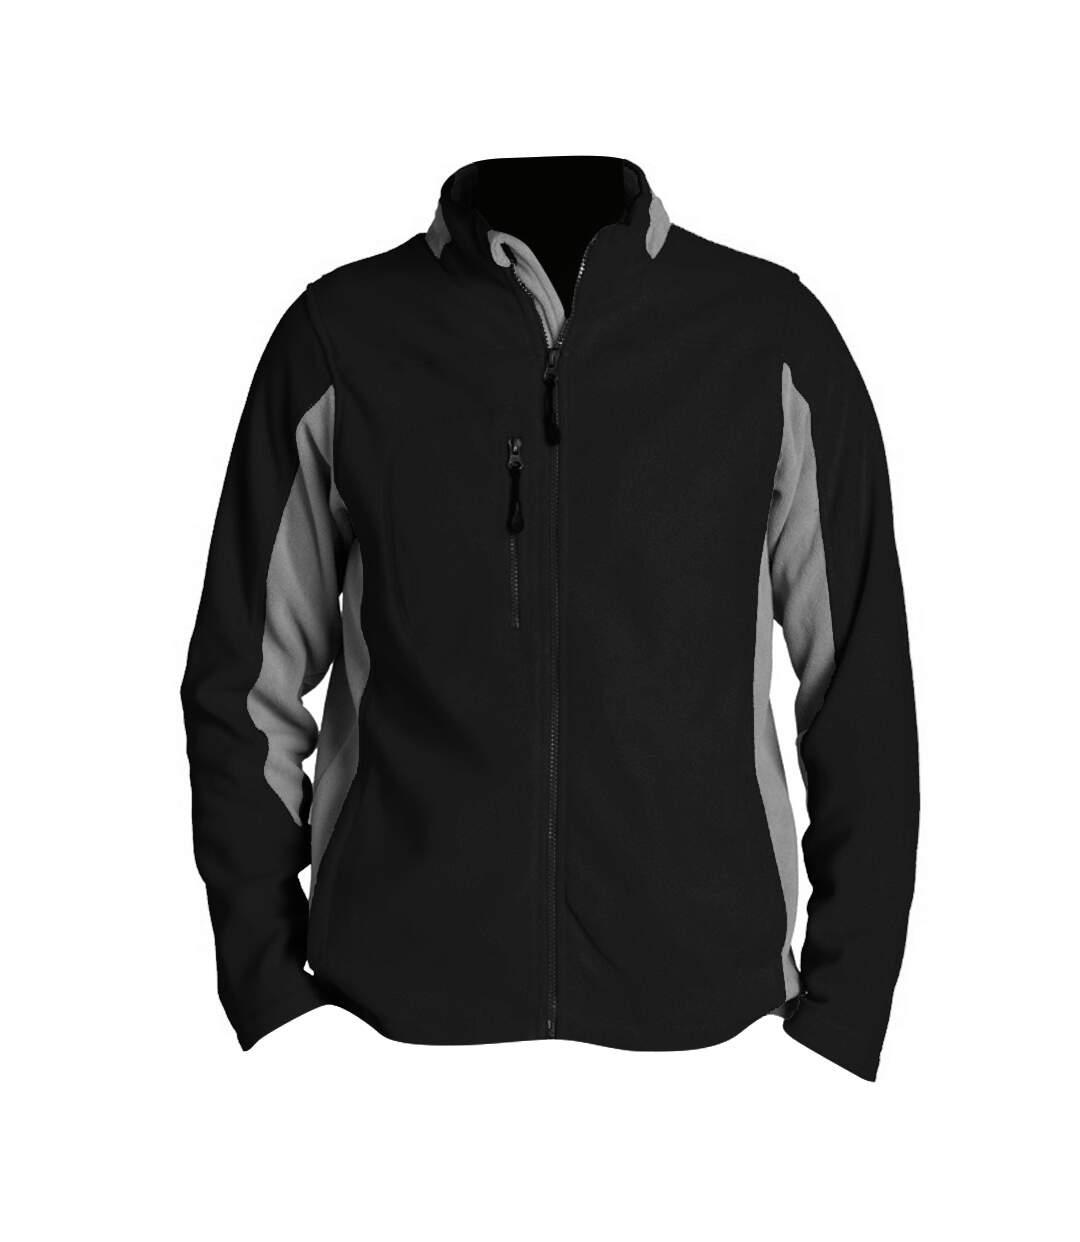 SOLS Mens Nordic Full Zip Contrast Fleece Jacket (Black/Medium Grey) - UTPC409